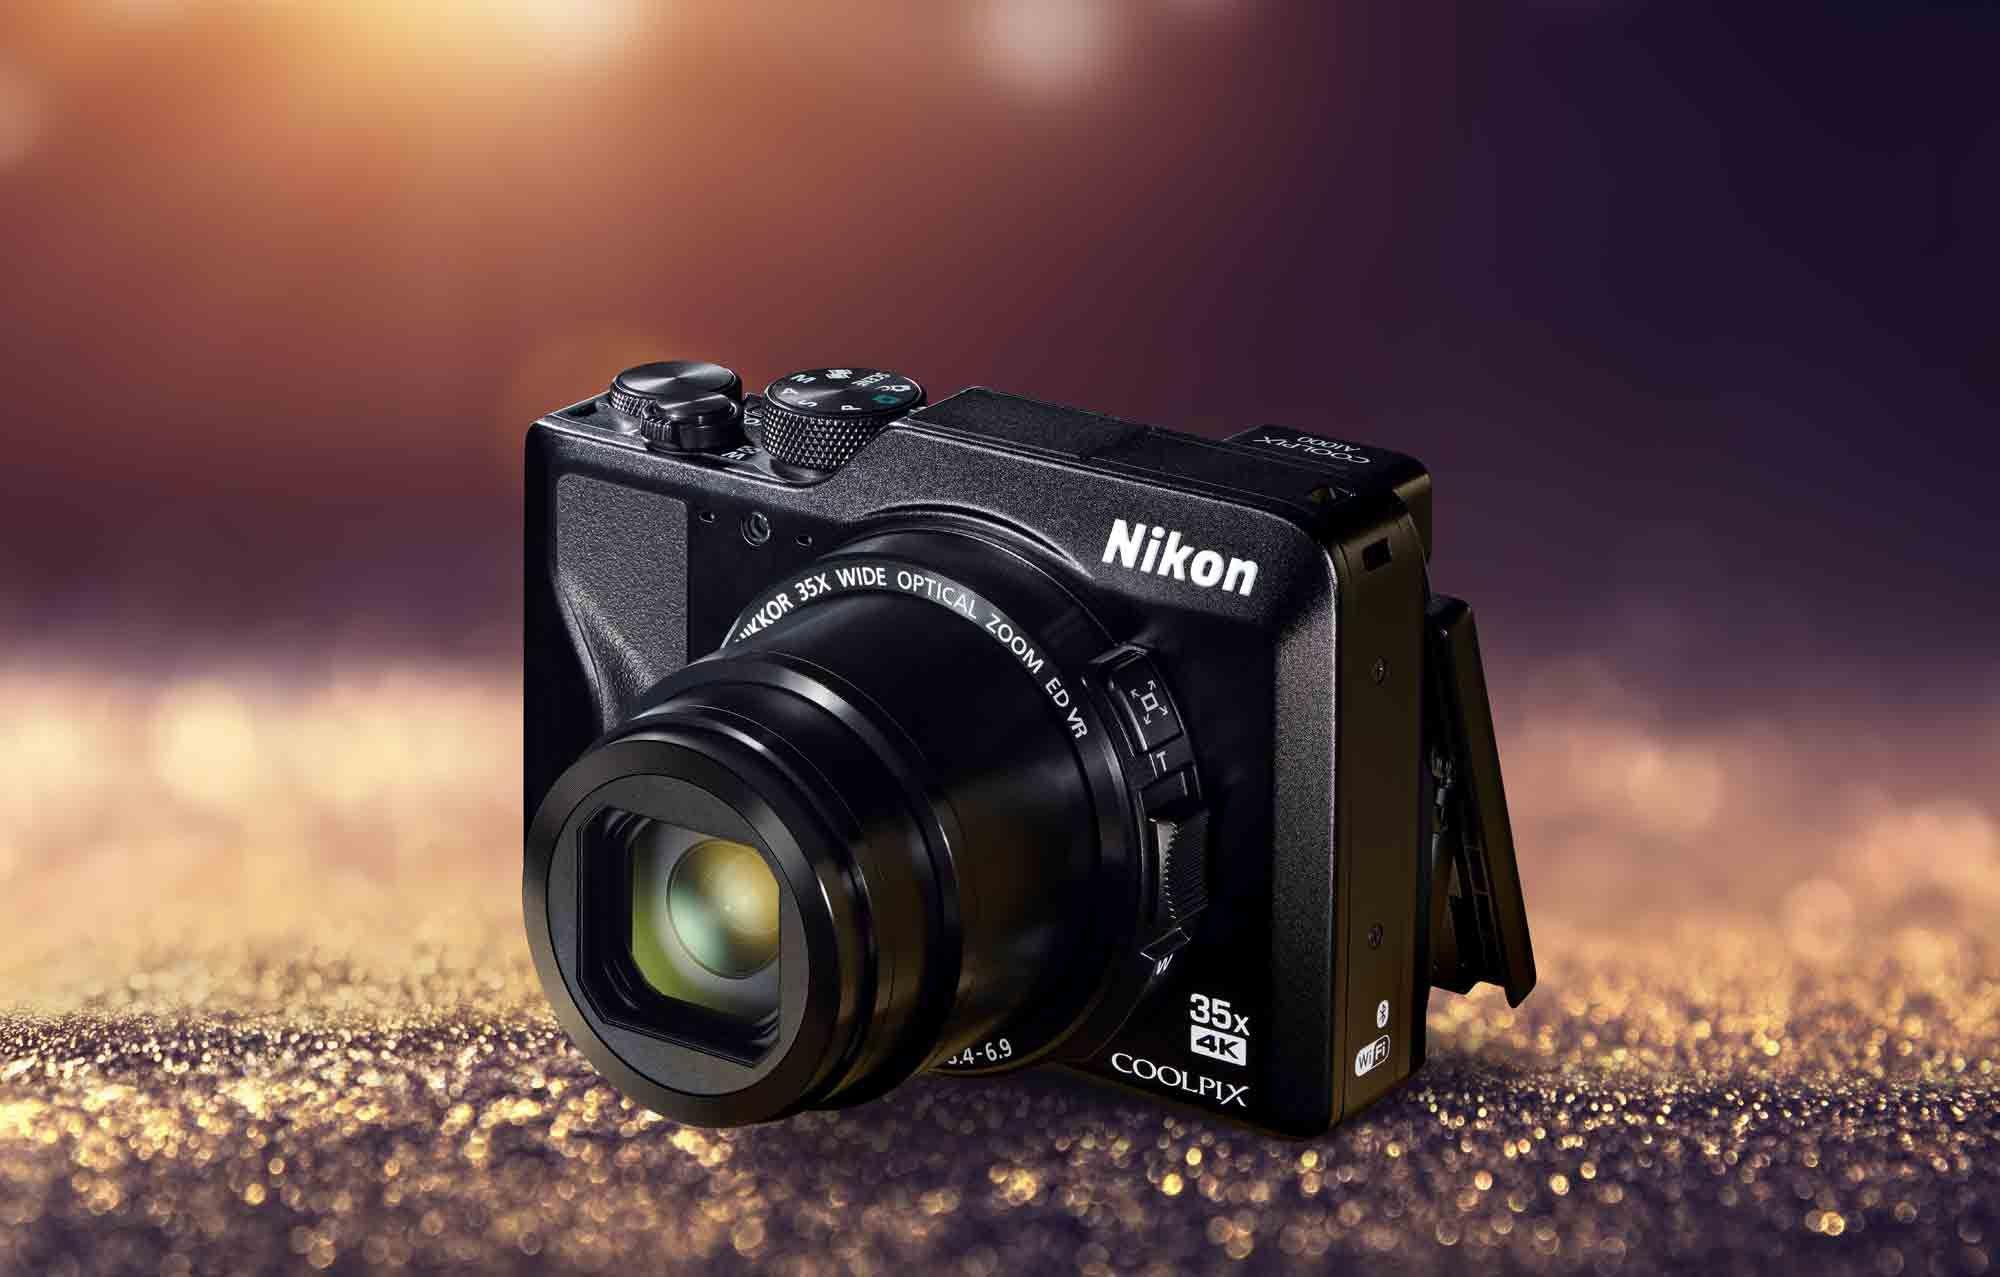 Nikon coolpix s9200 review uk dating